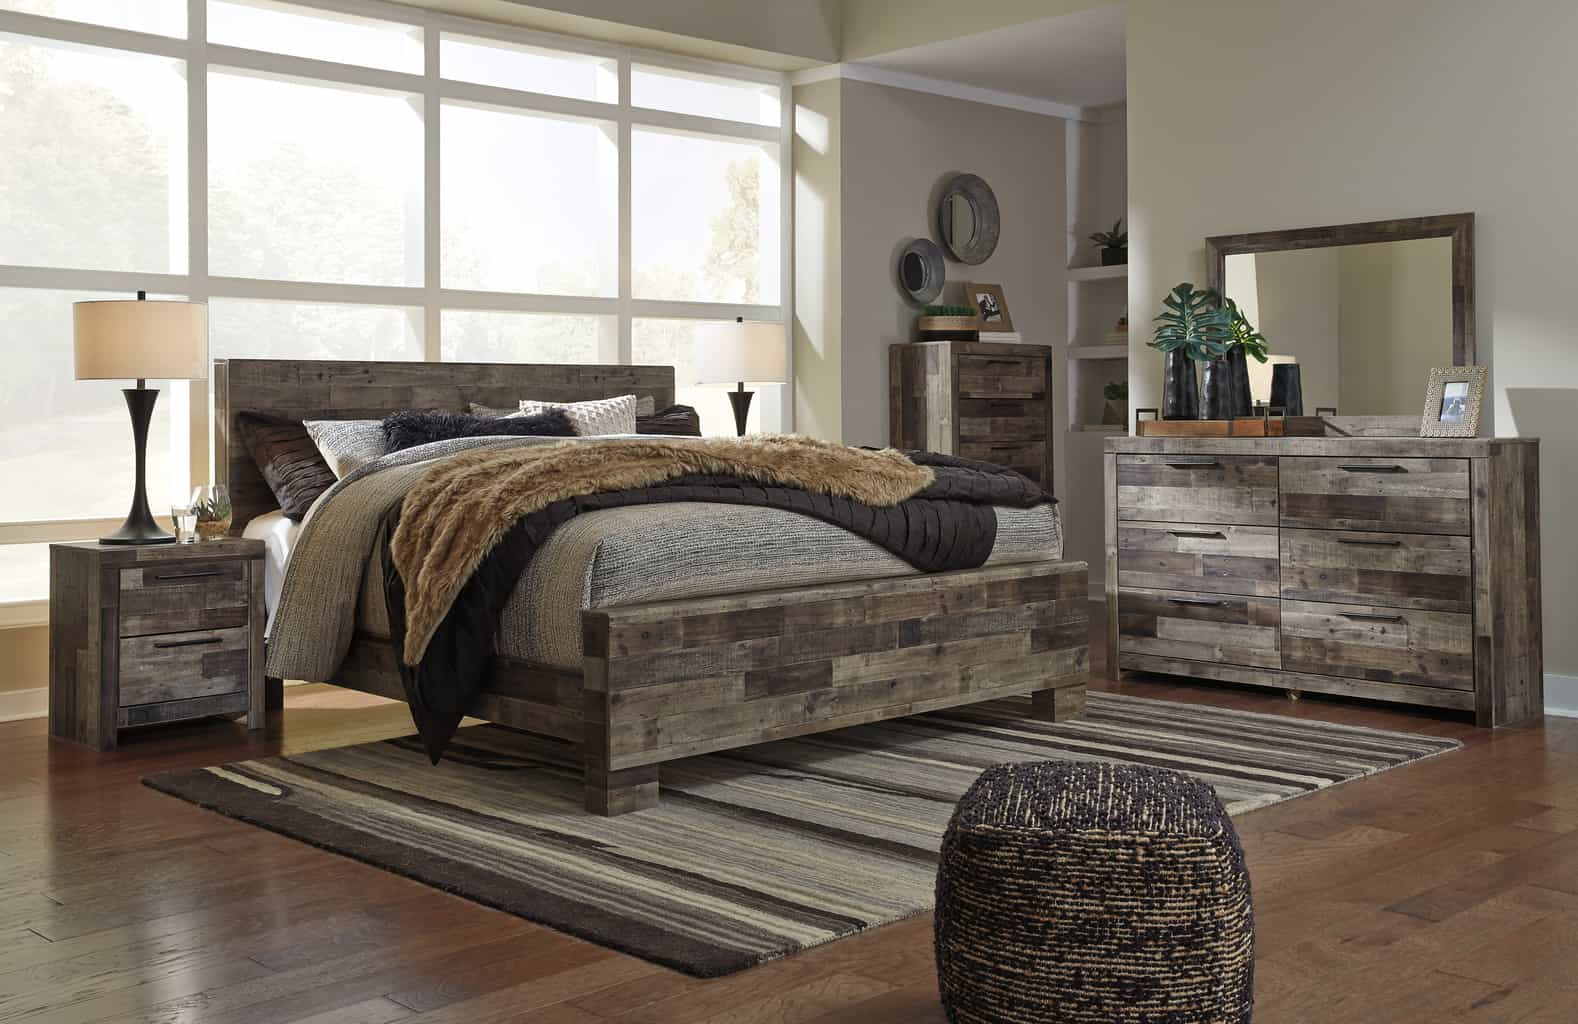 Derekson multi gray king panel bedroom set cincinnati - Bedroom furniture set online shopping ...